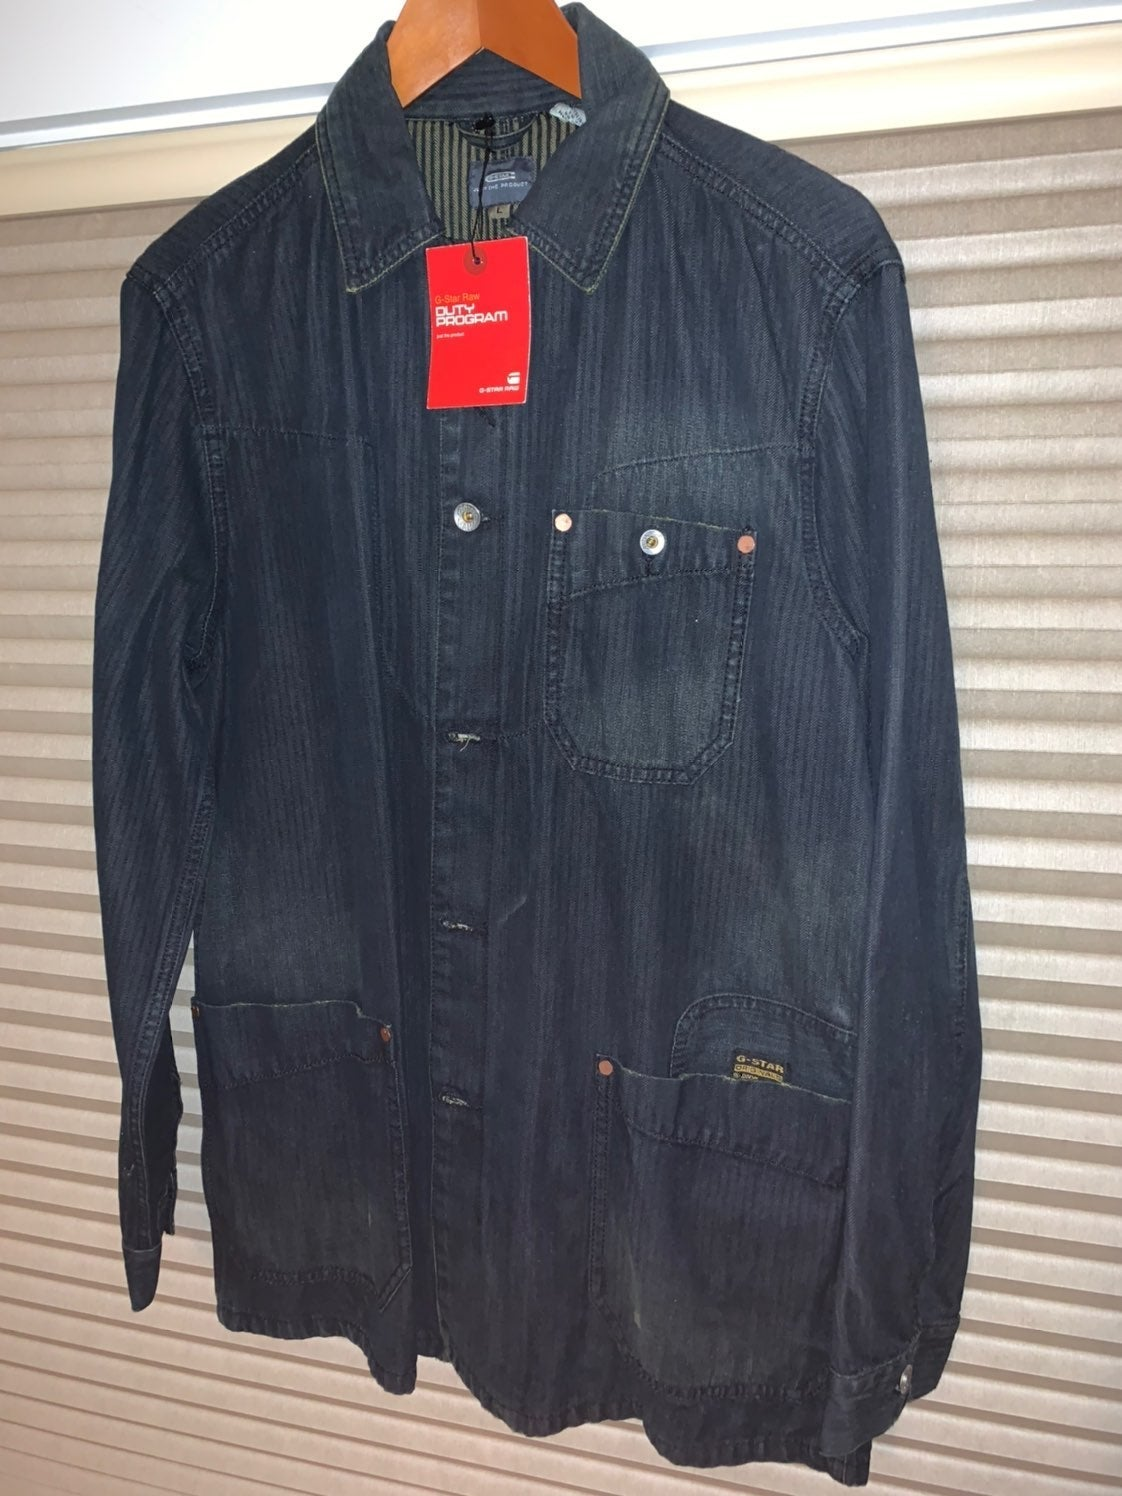 G-Star Raw Jacket